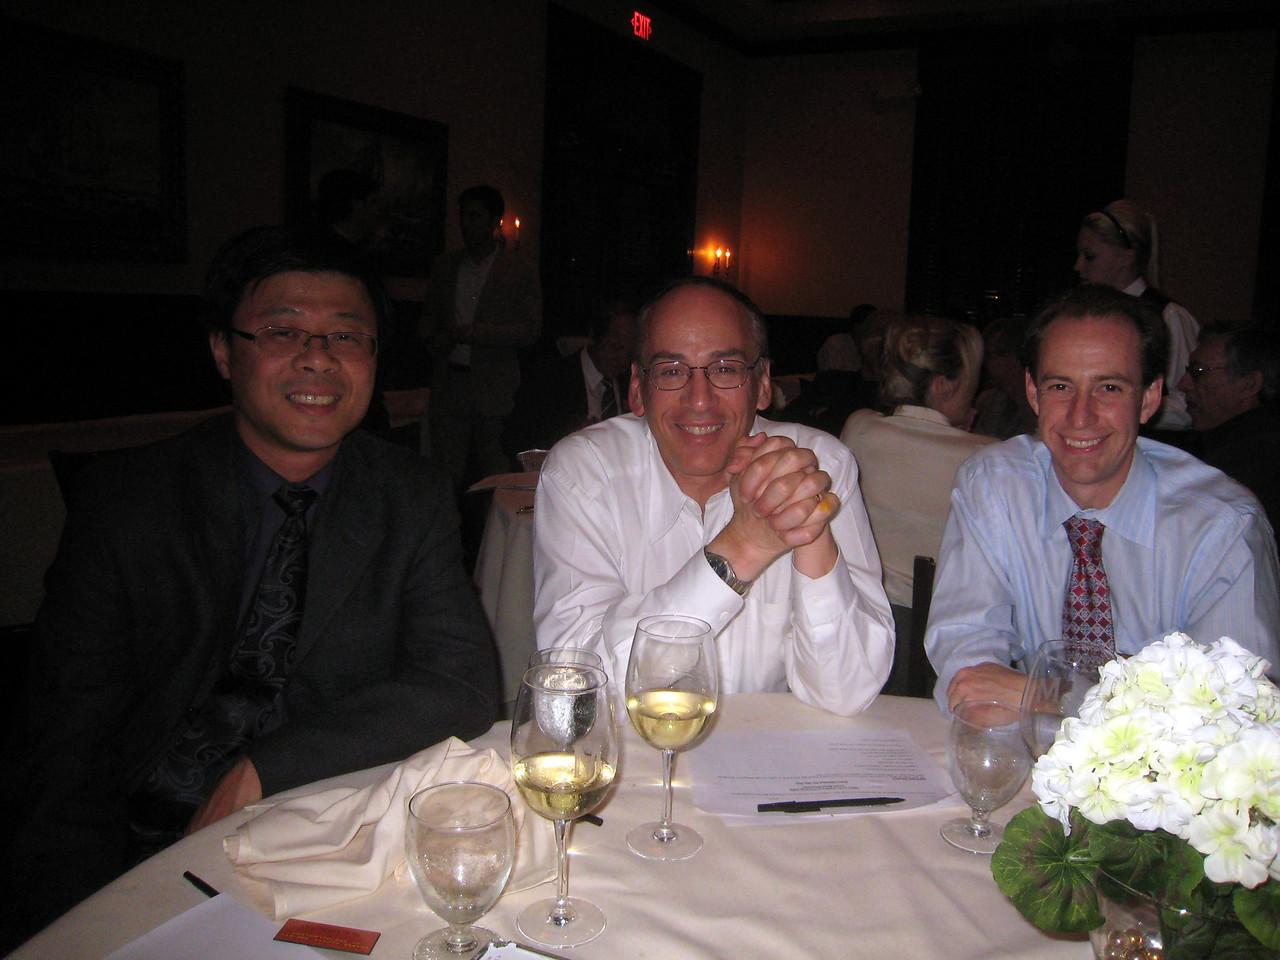 Norman Liu, Scott Grant, Sean Adrean